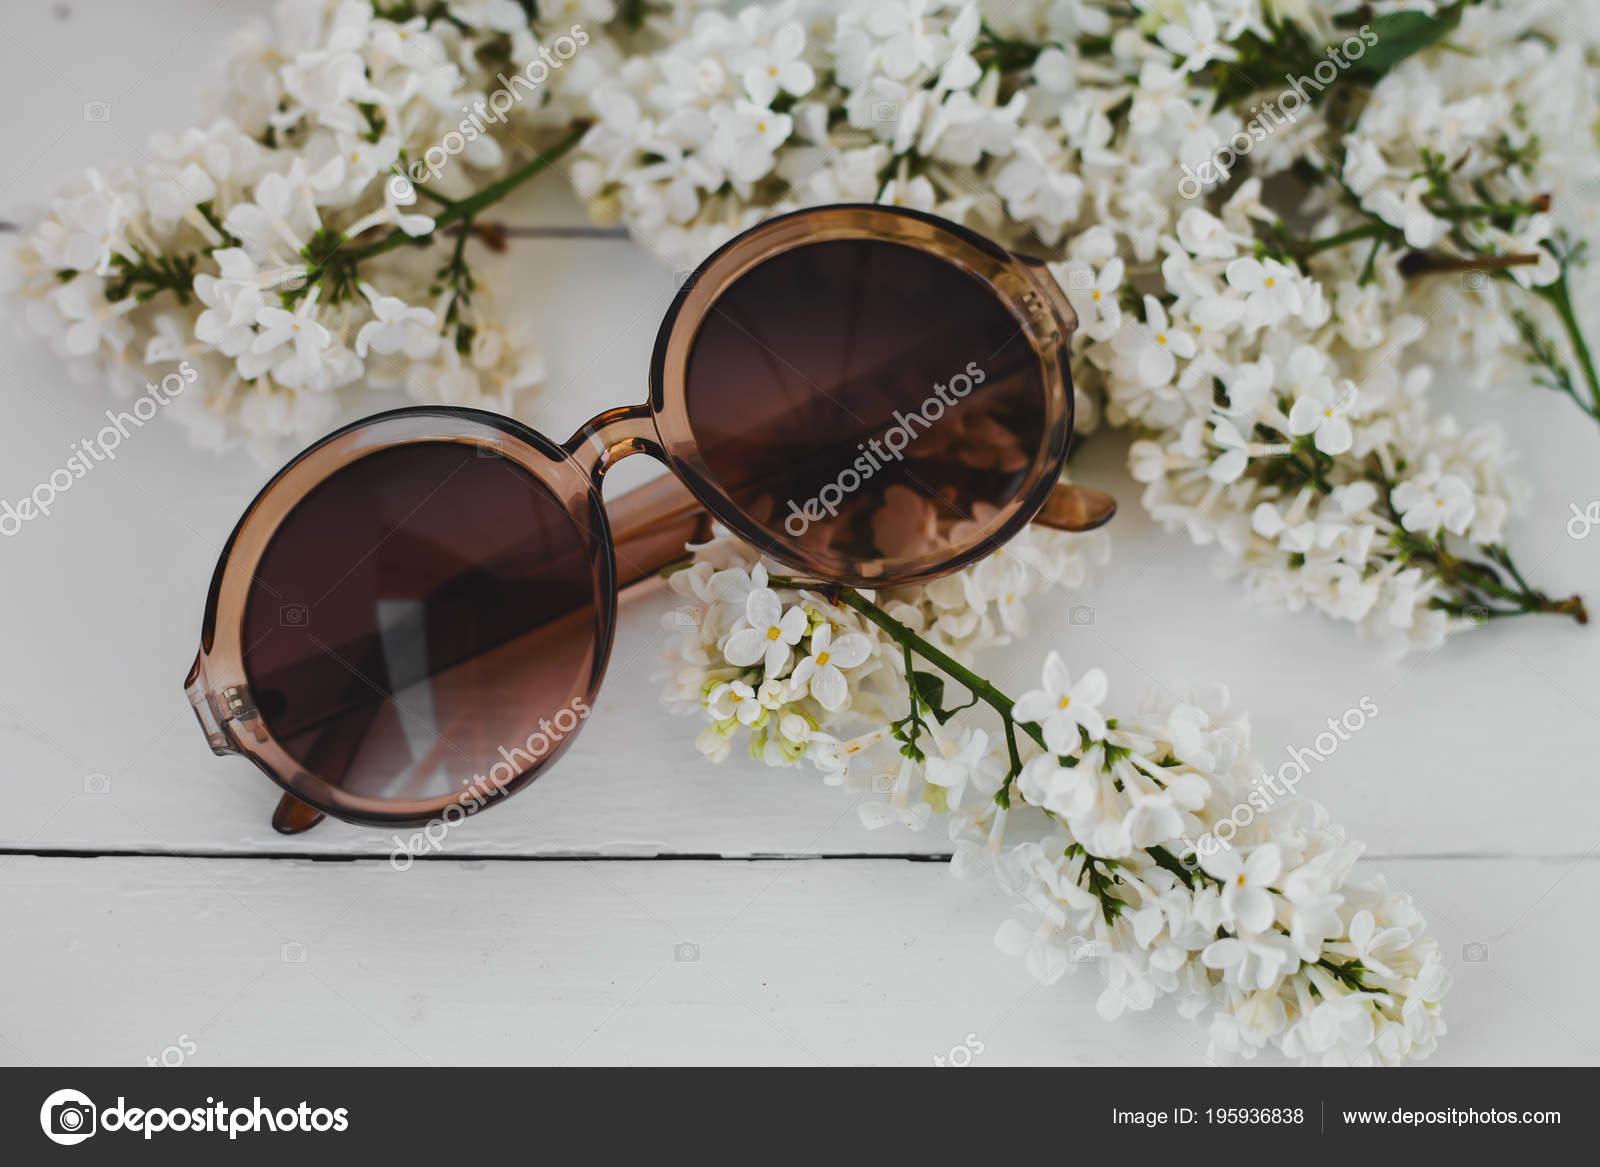 b1922da8ce Elegantes Gafas Sol Con Flores Sobre Fondo Blanco Madera — Foto de Stock